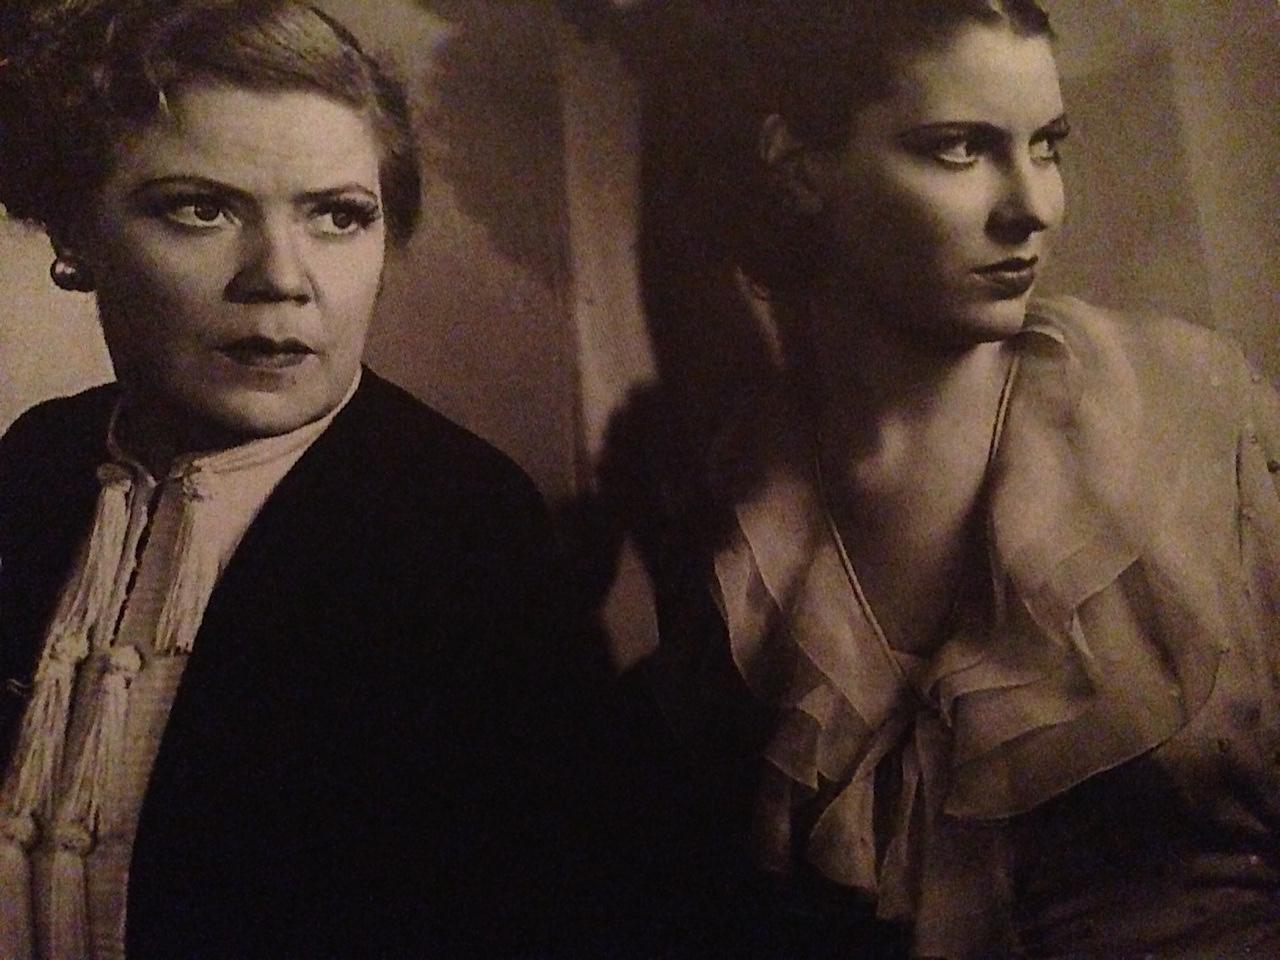 Spring Byington and Valerie Hobson in Werewolf of London